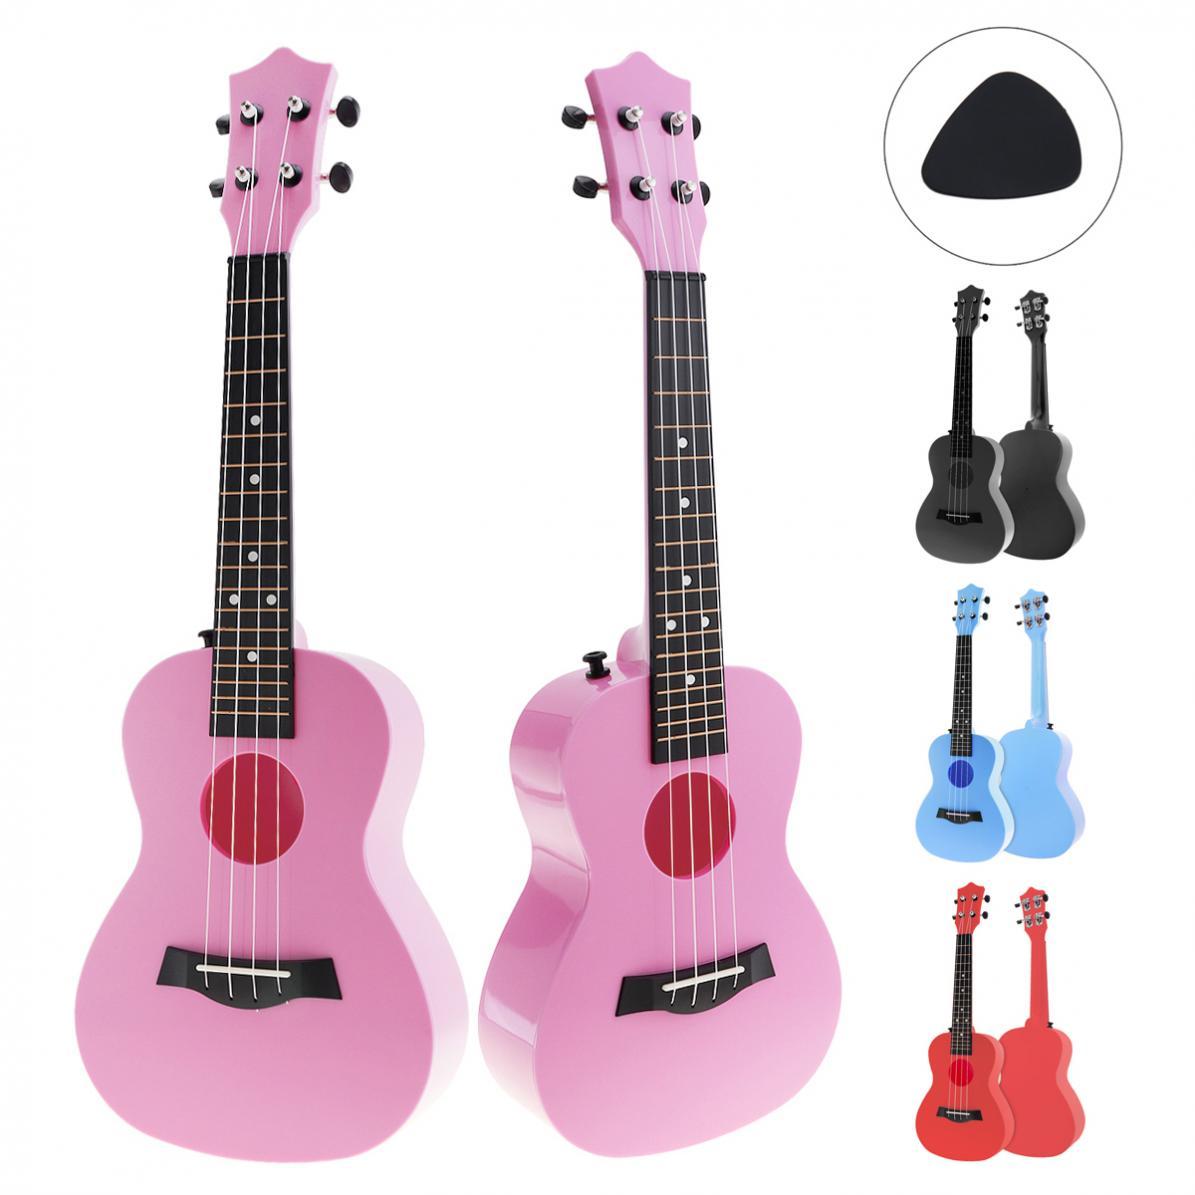 23 Inch Concert  Colorful Acoustic Ukulele Uke 4 Strings Hawaii Guitar Guitarra Instrument For Kids And Music Beginner